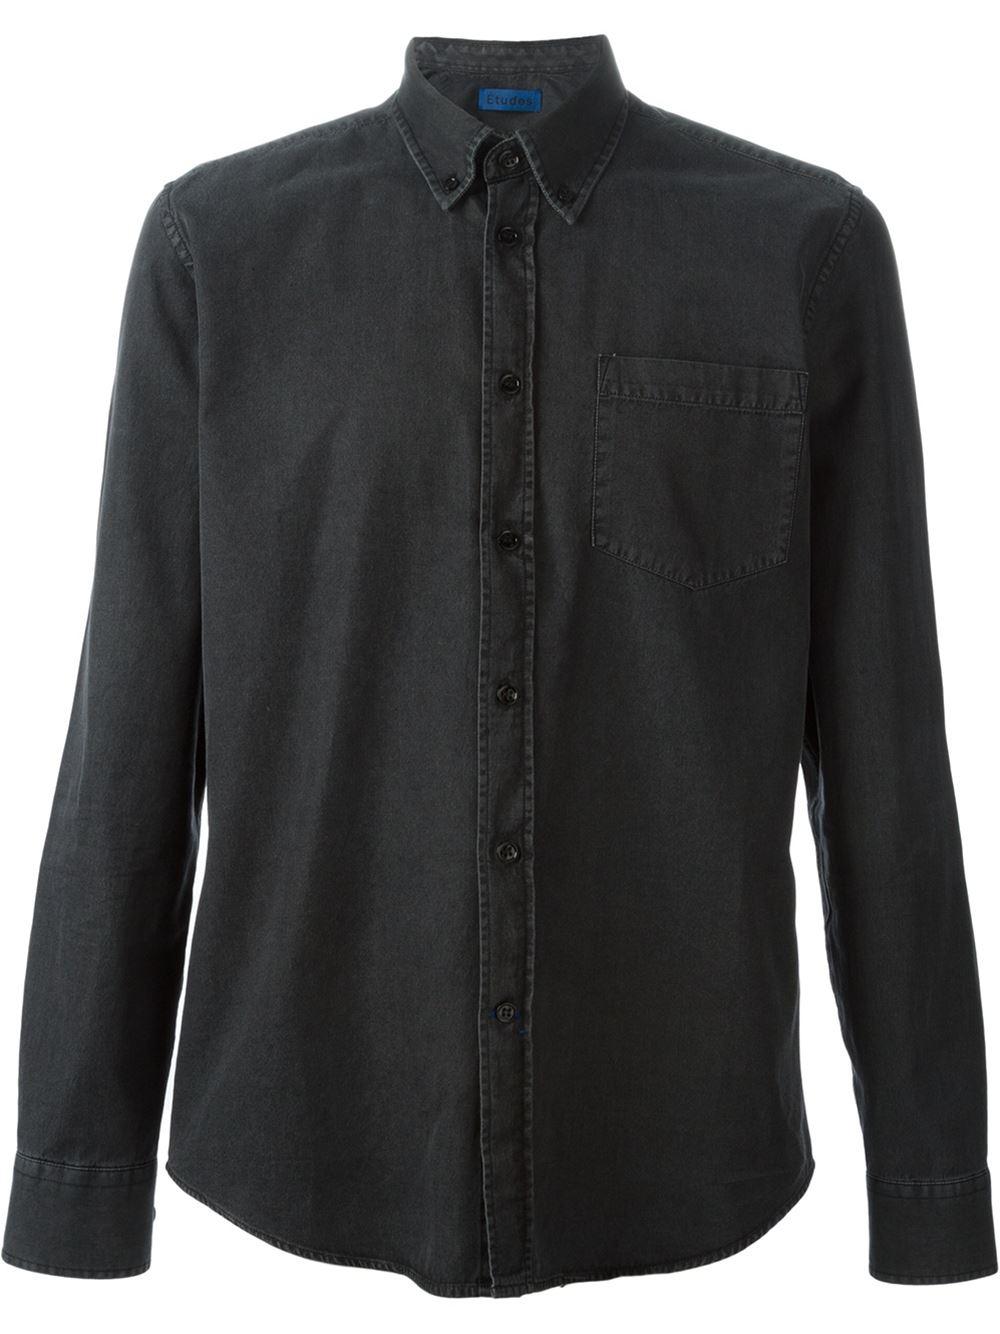 Etudes button down denim shirt in black for men lyst for Denim button down shirts